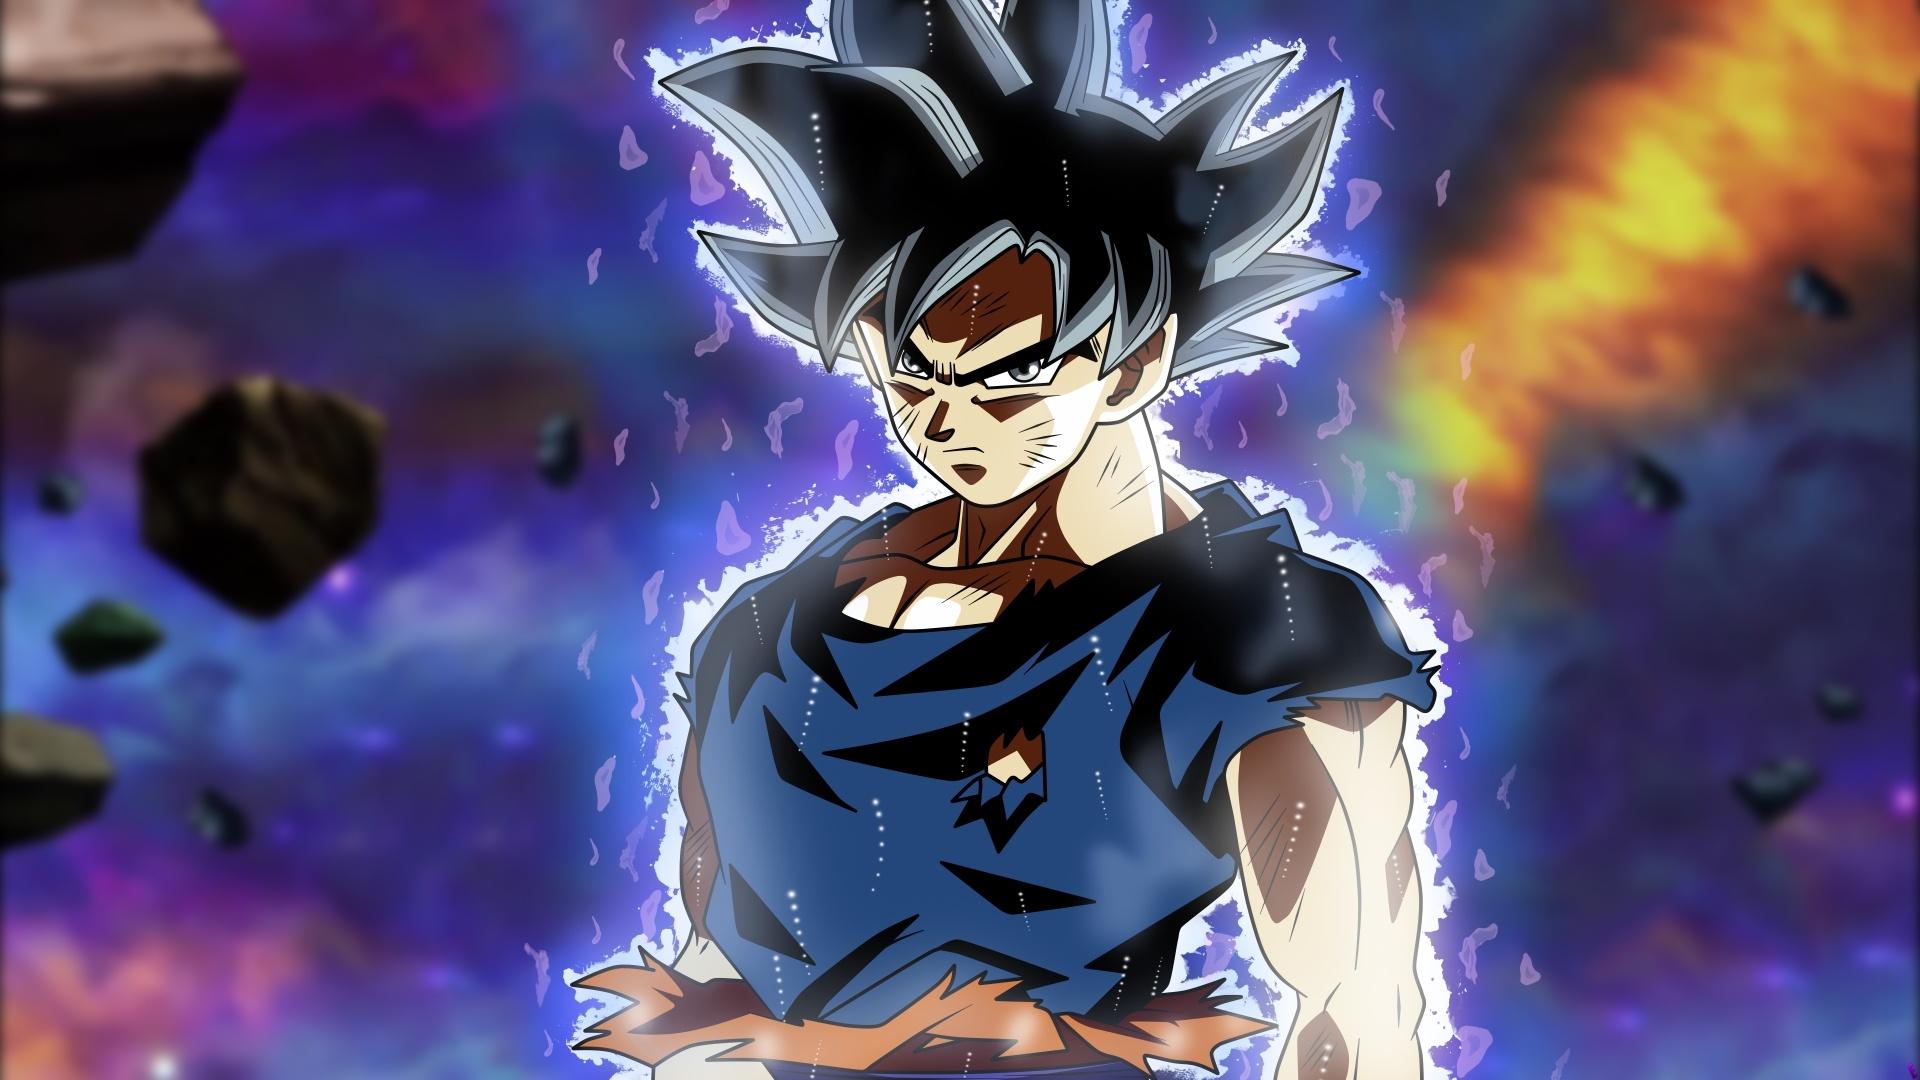 Goku Ultra Instinct pc wallpaper